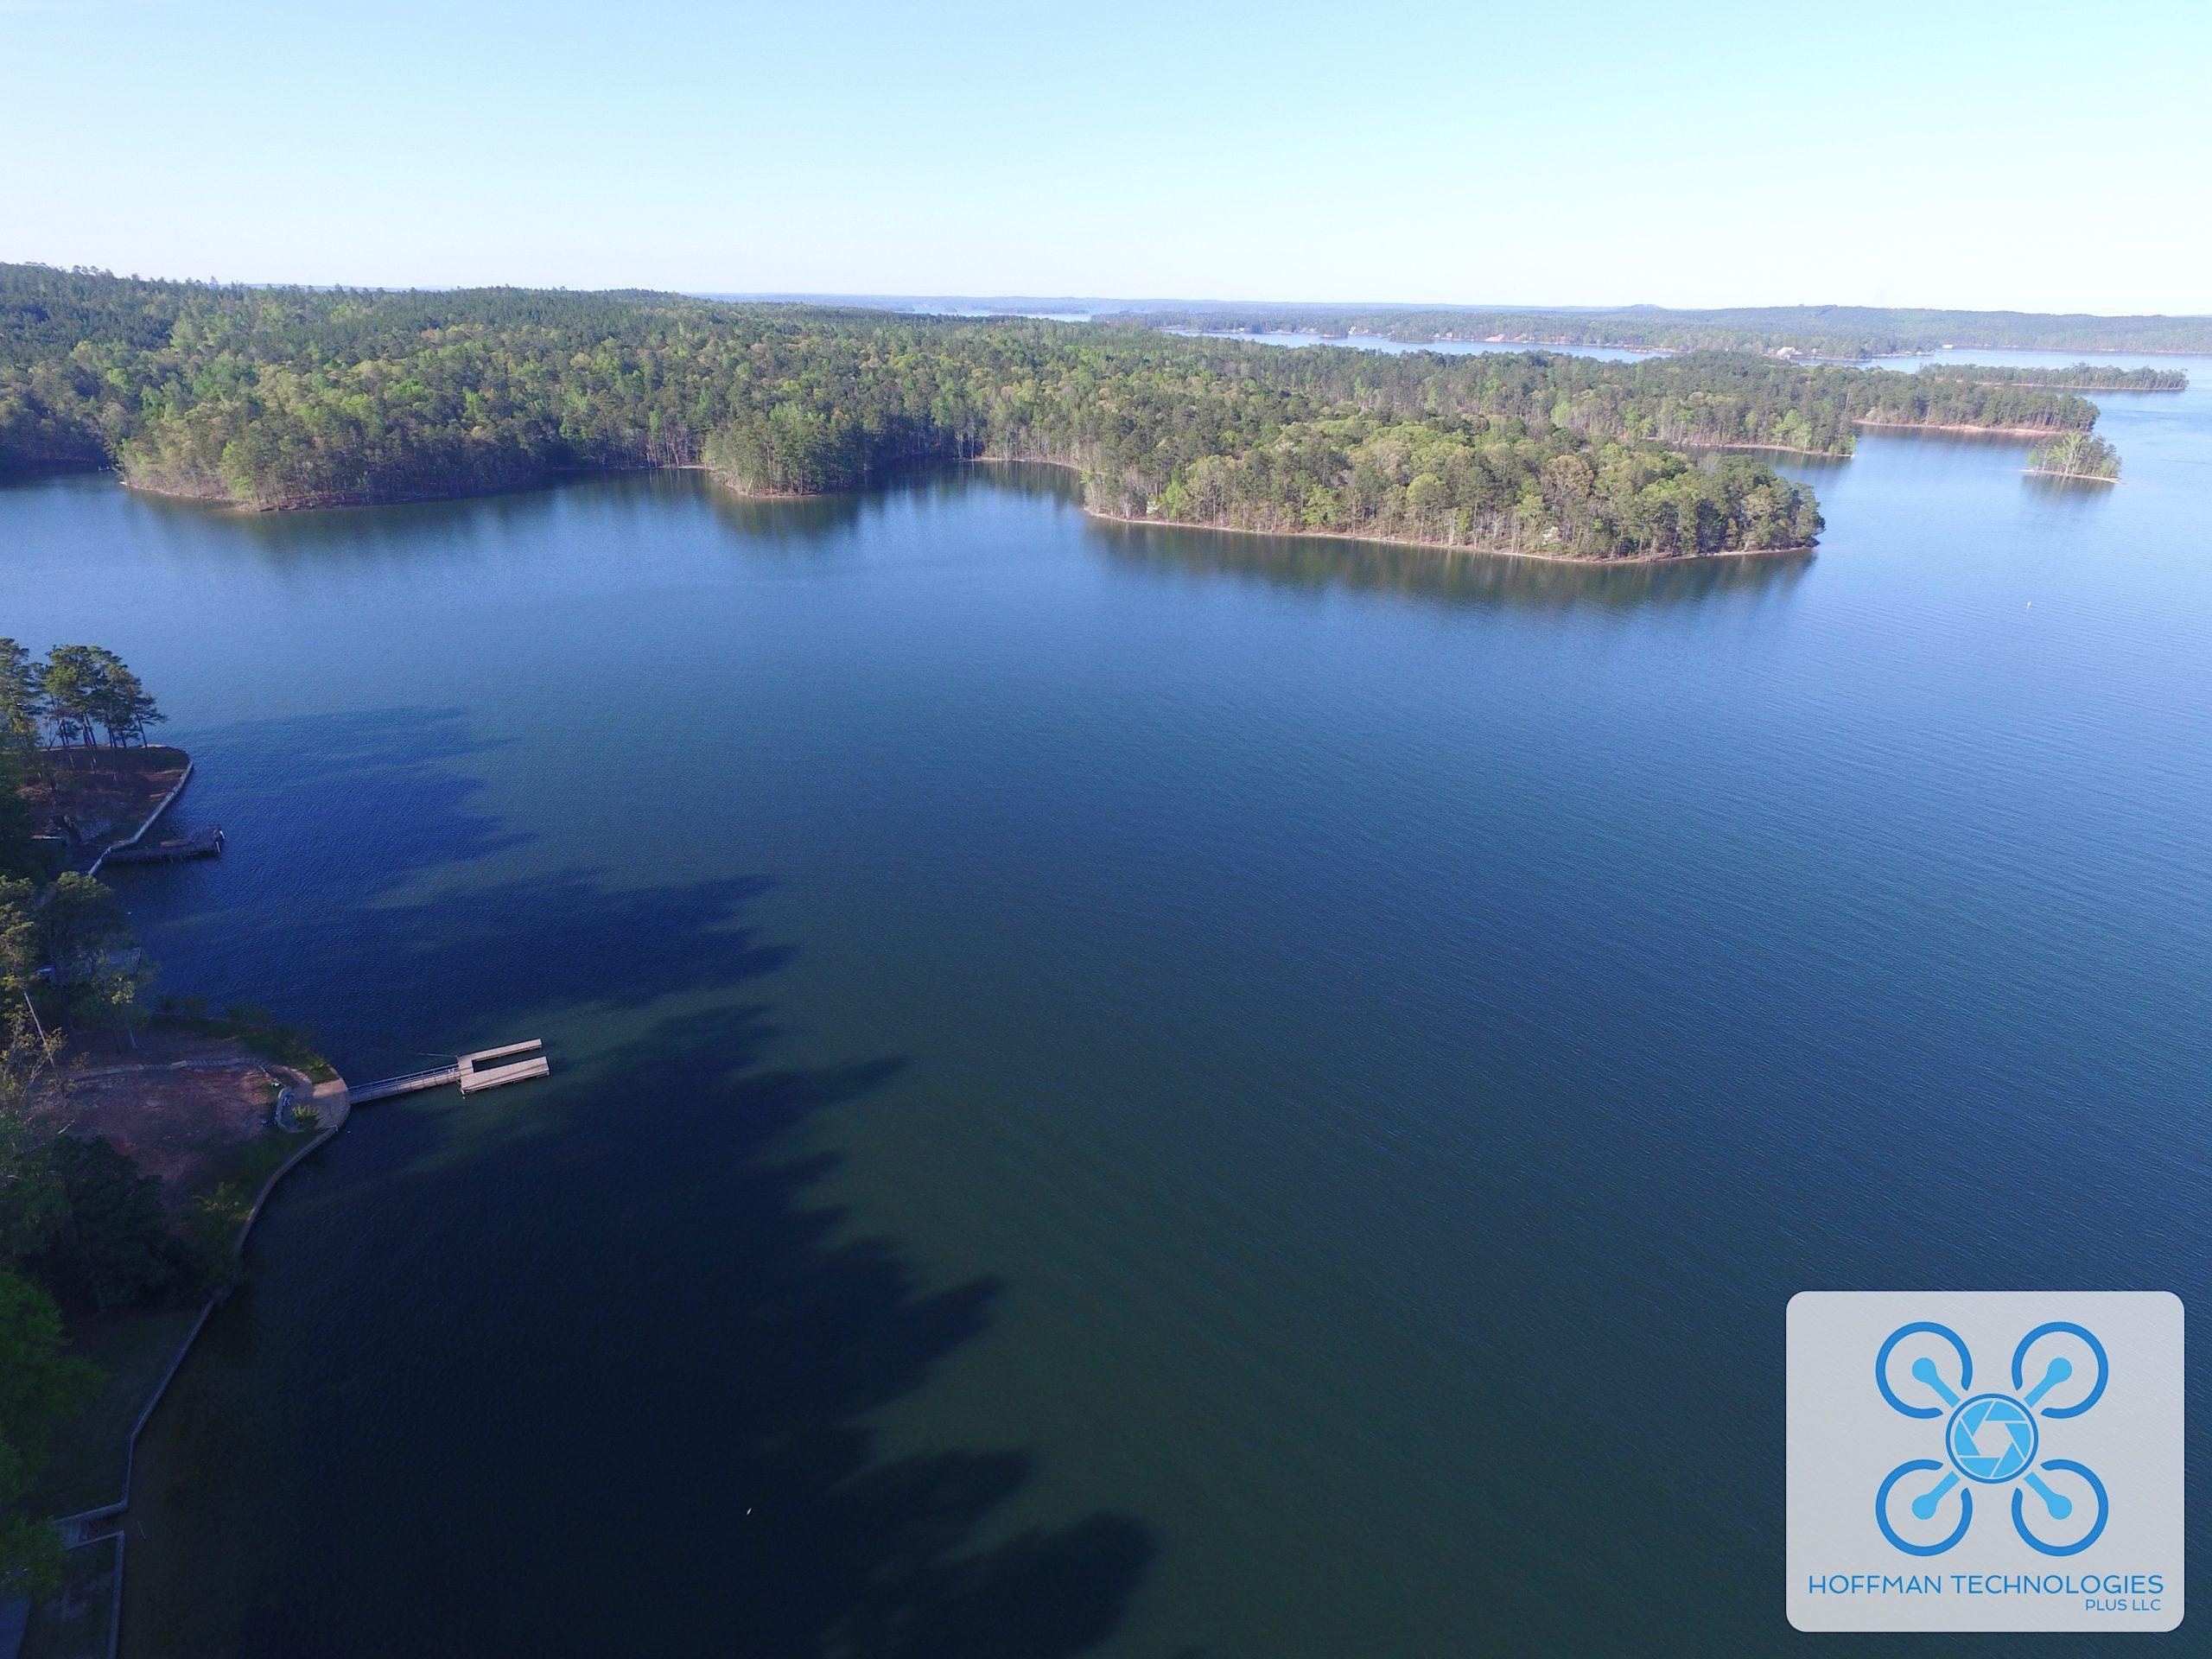 Hoffman Technologies Plus Aerial Lake Image